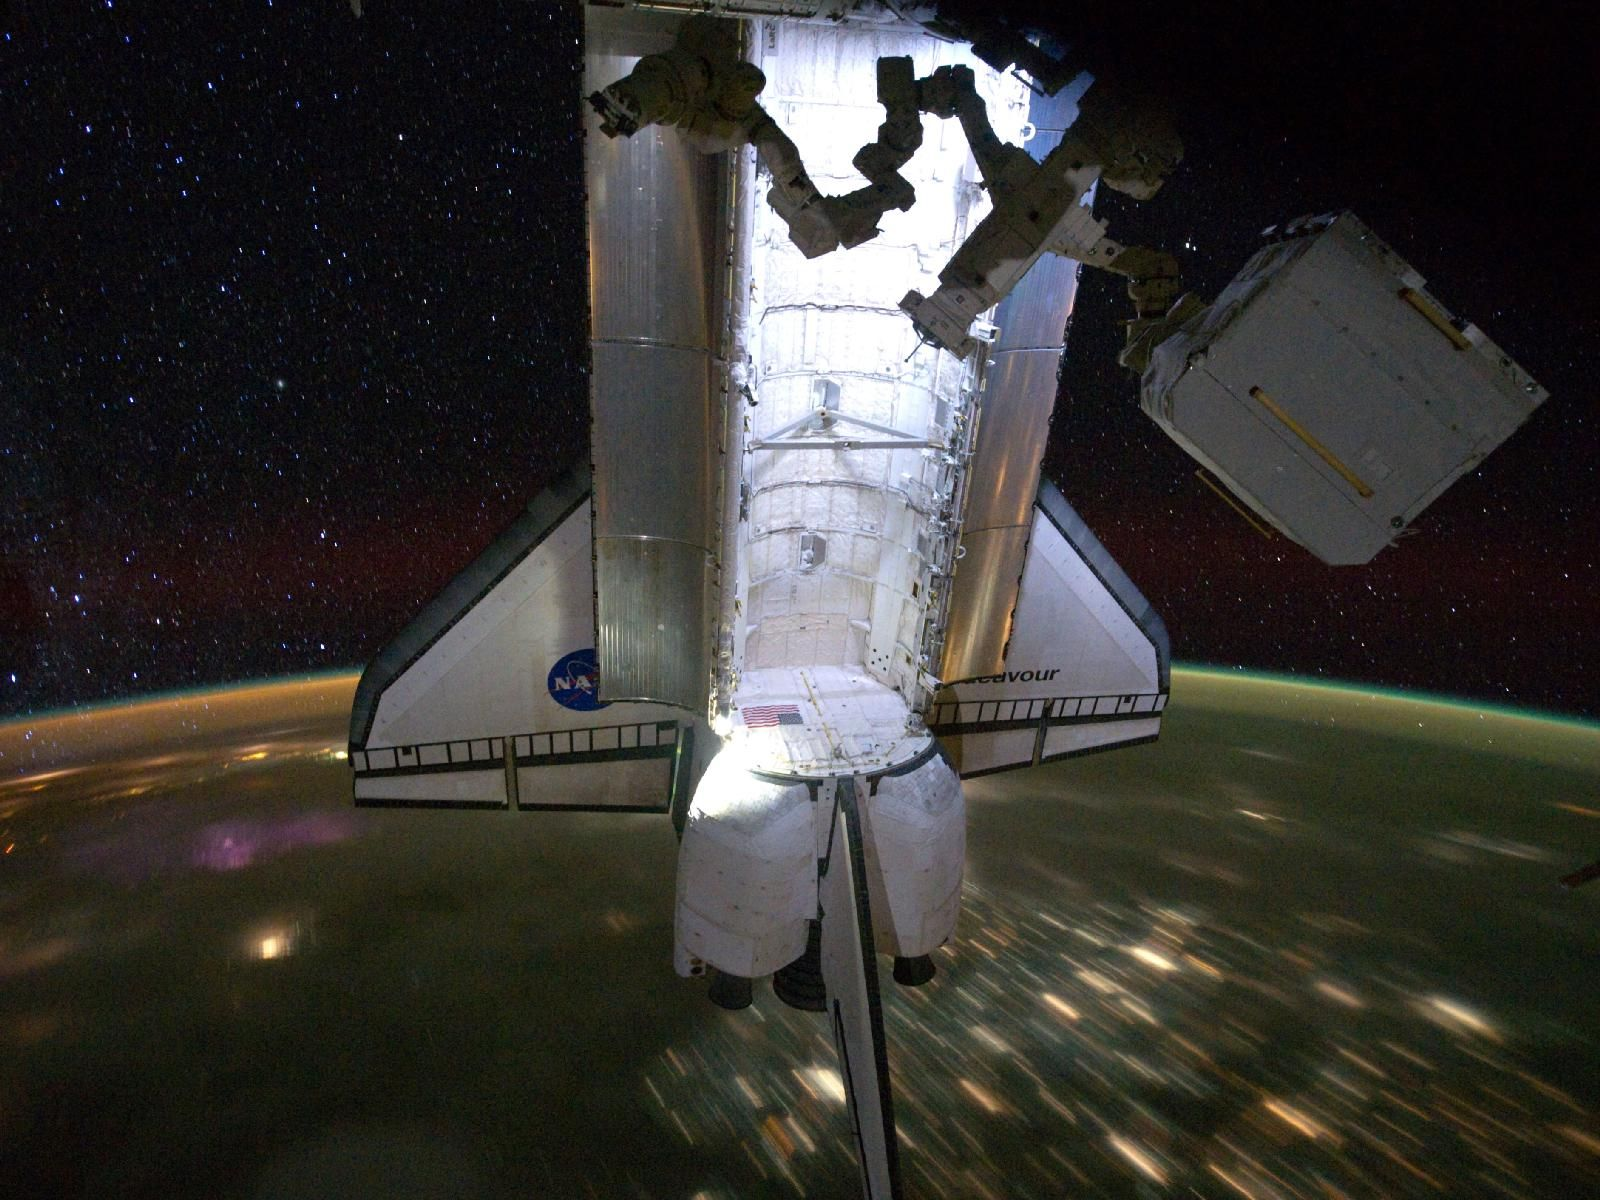 Vote Now What S Your Favorite Space Shuttle Urutazas Urkutatas